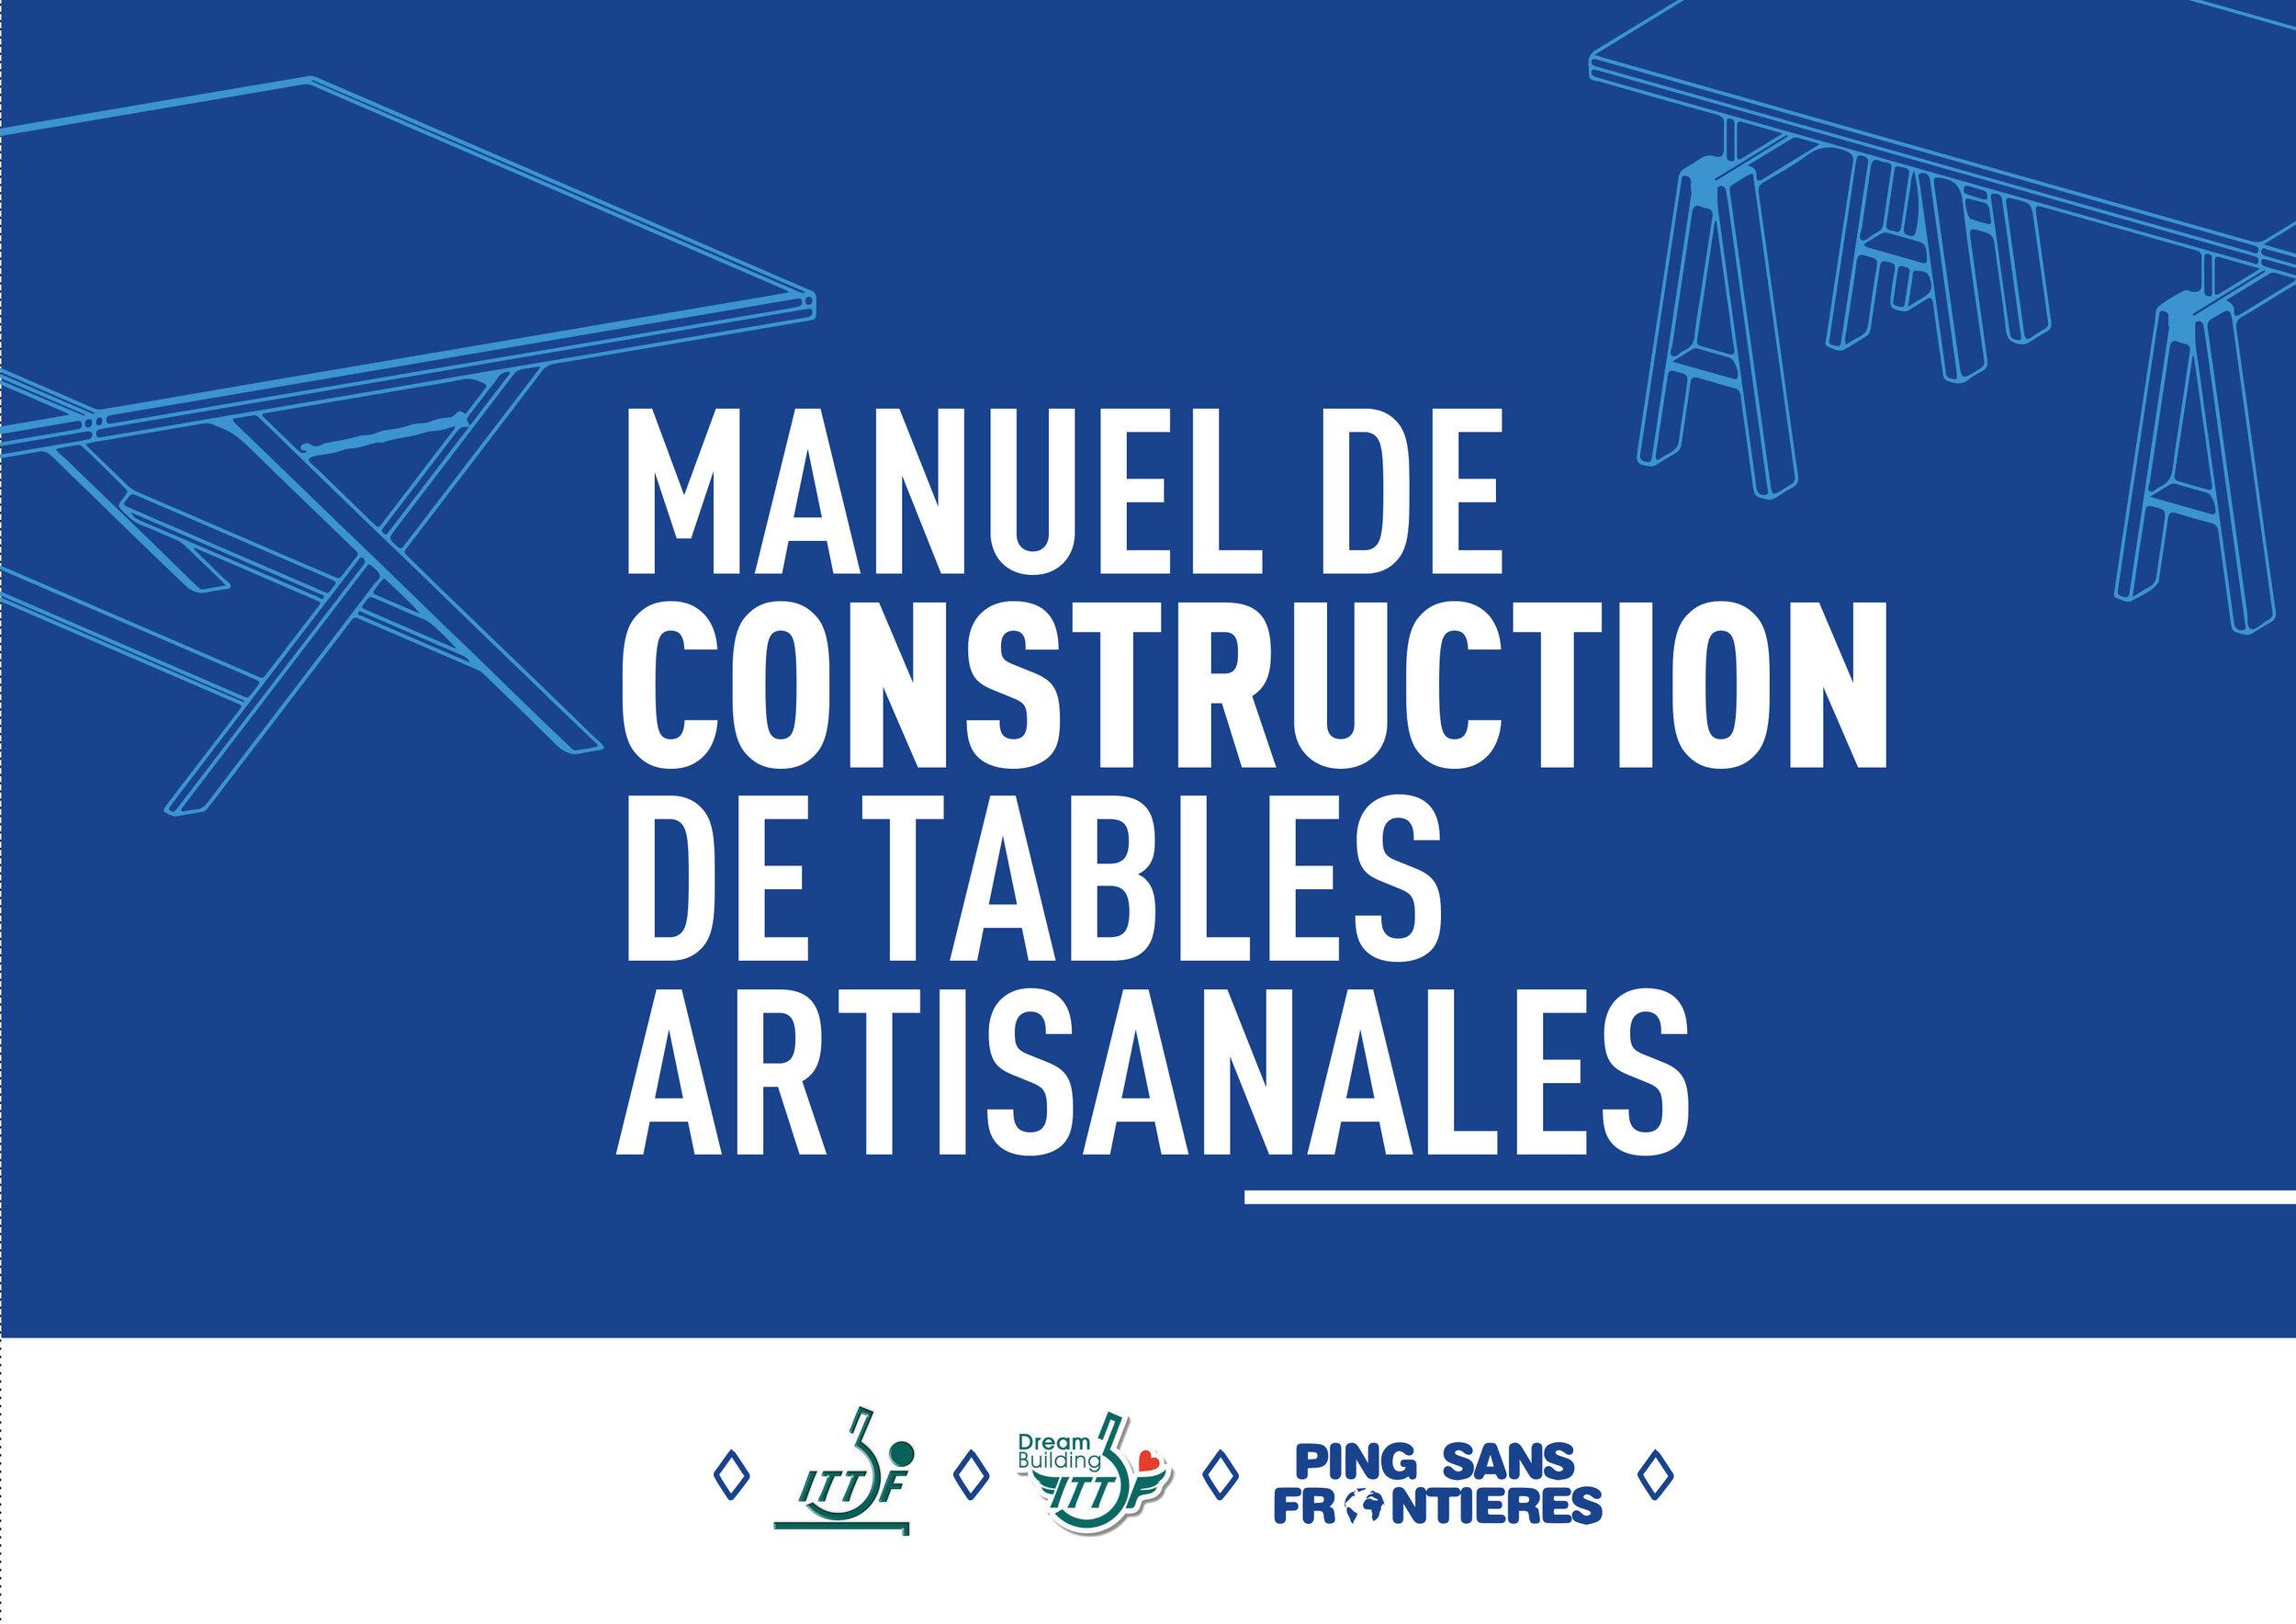 Manuel-de-construction-de-tables-artisanales-1.jpg